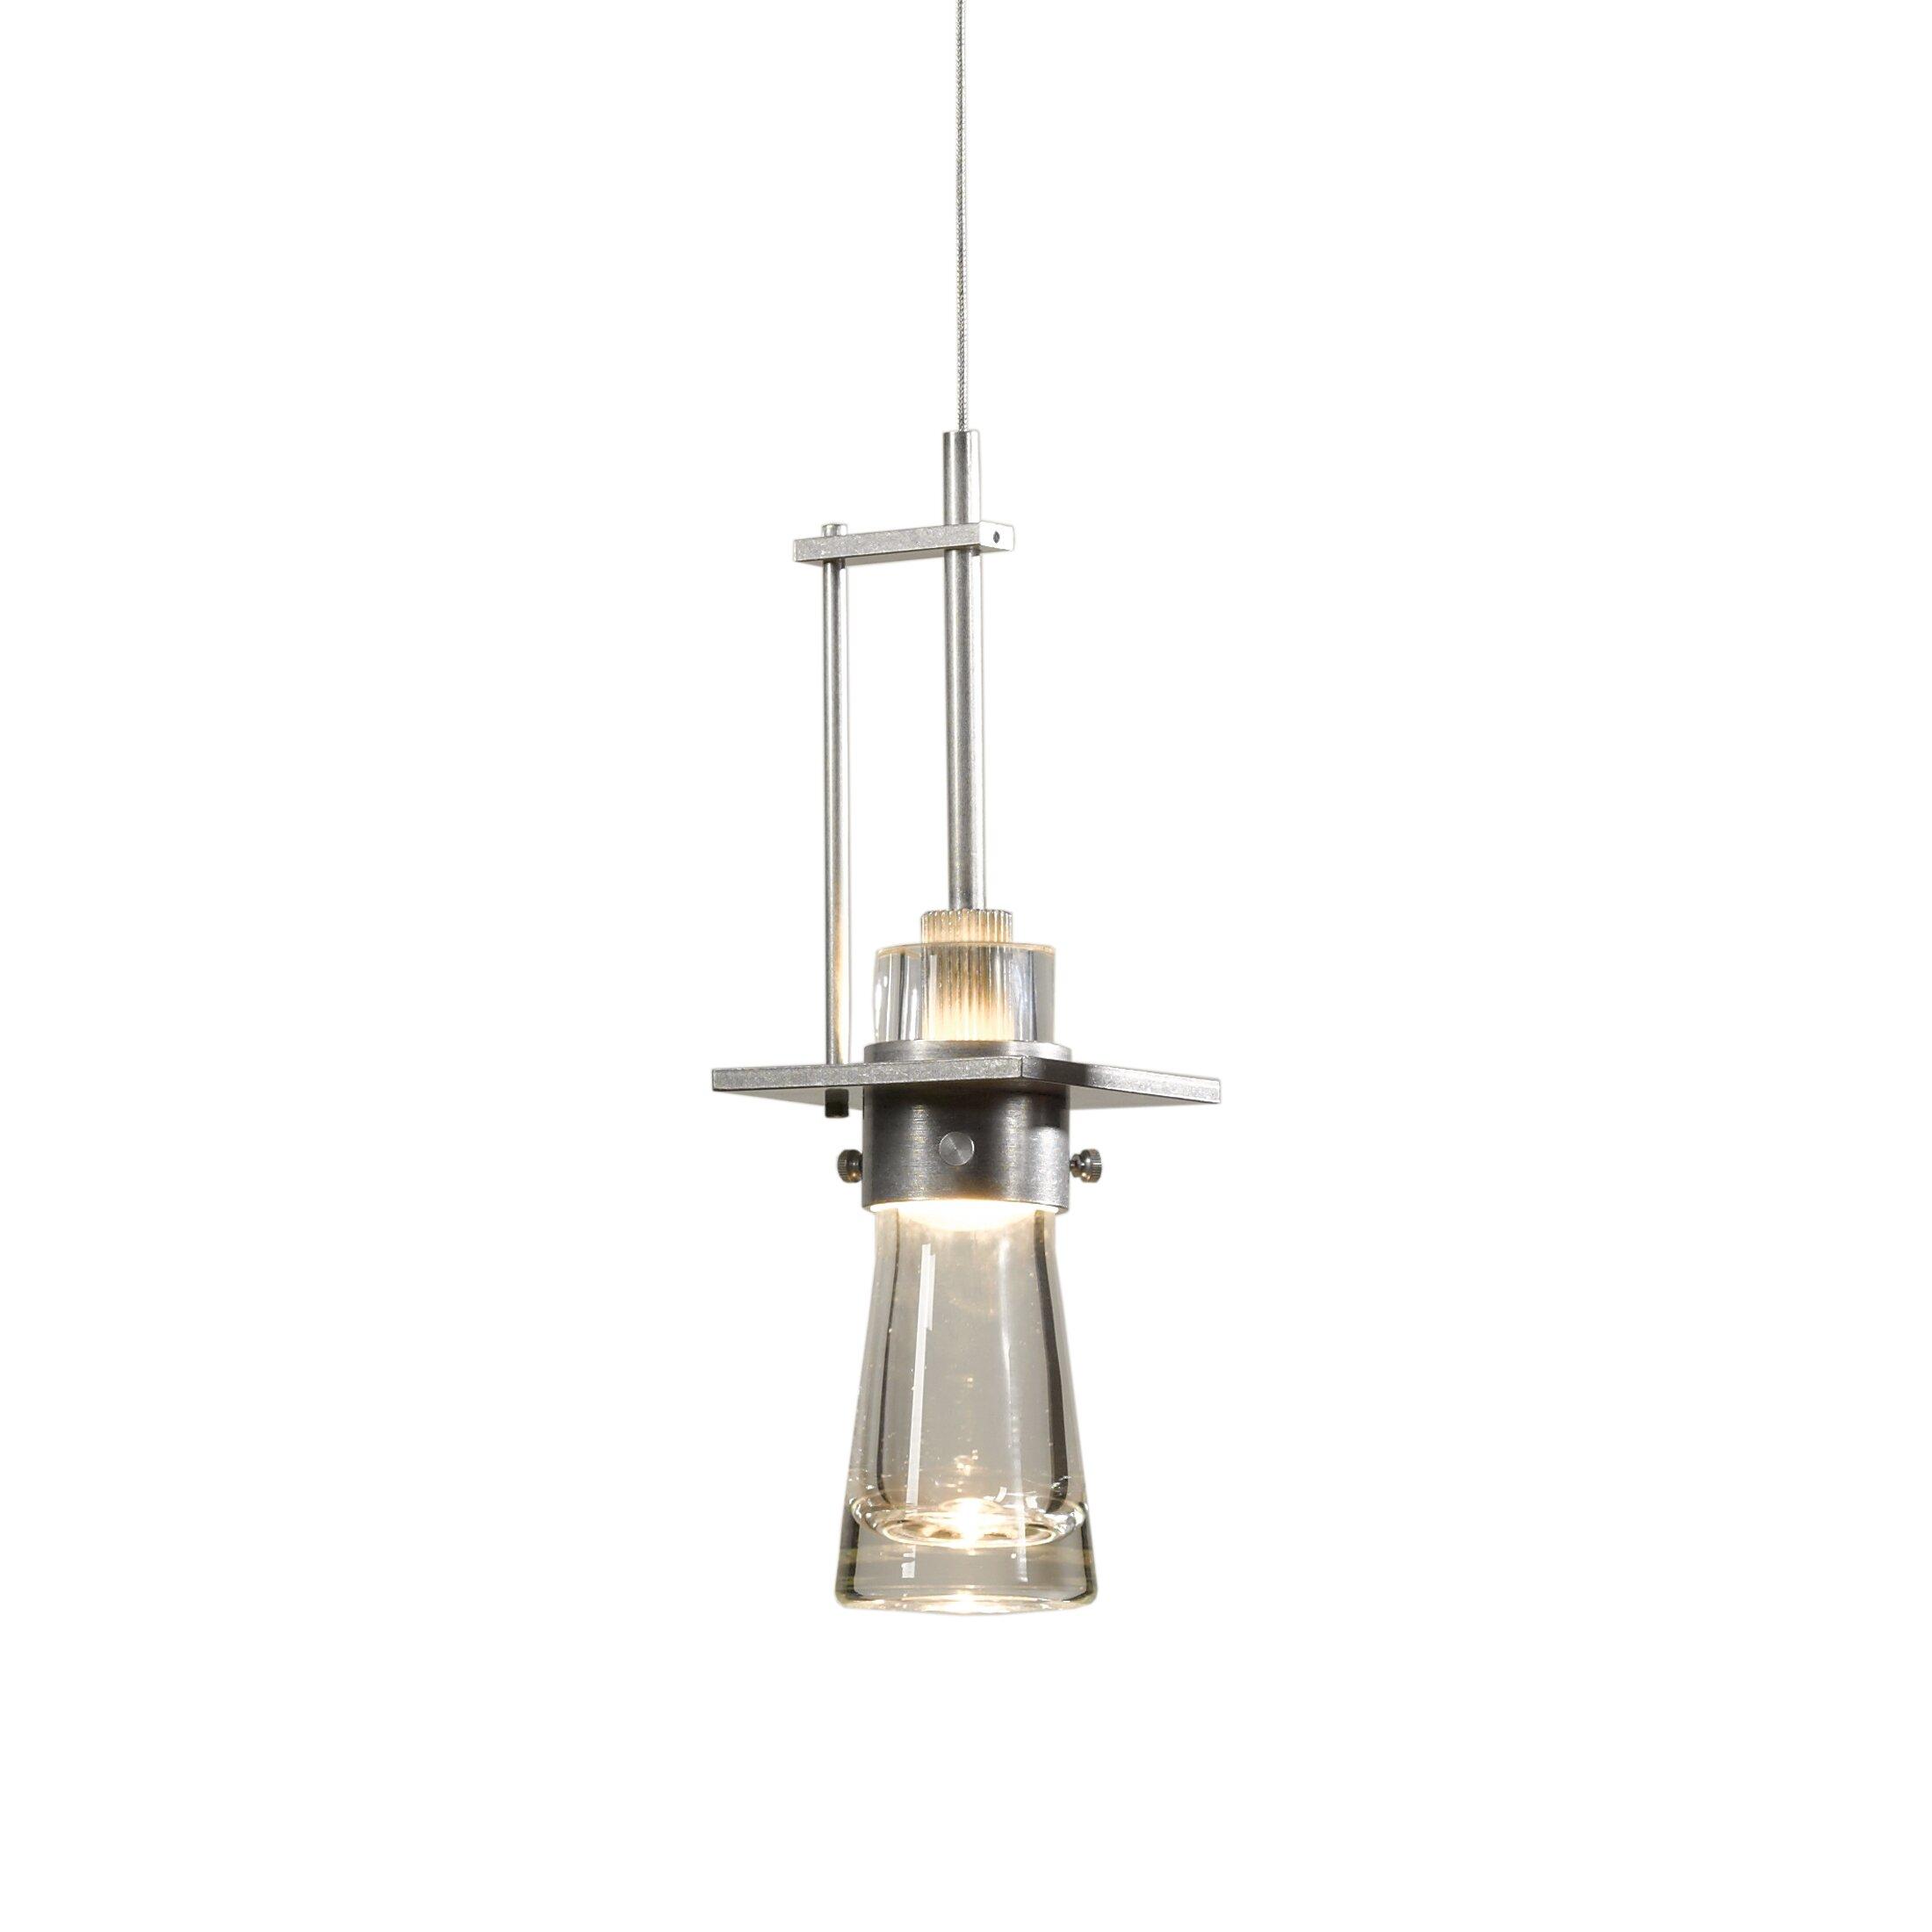 Hubbardton forge erlenmeyer 1 light pendant reviews wayfair for Hubbardton forge bathroom lighting